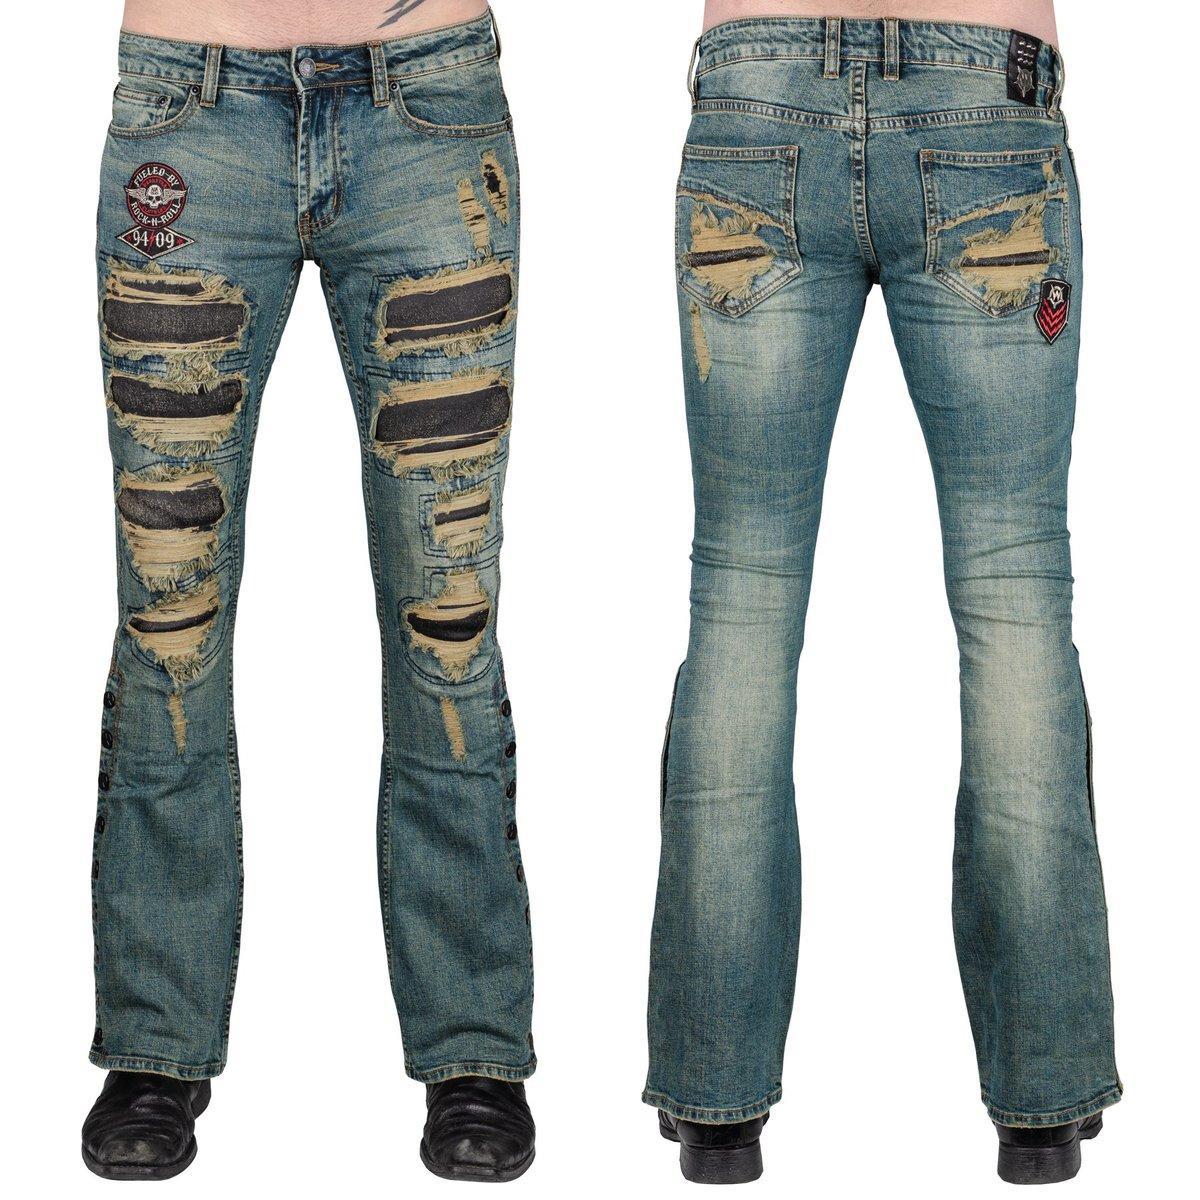 kalhoty pánské (jeans) WORNSTAR - Diurne - WSGP-DIU